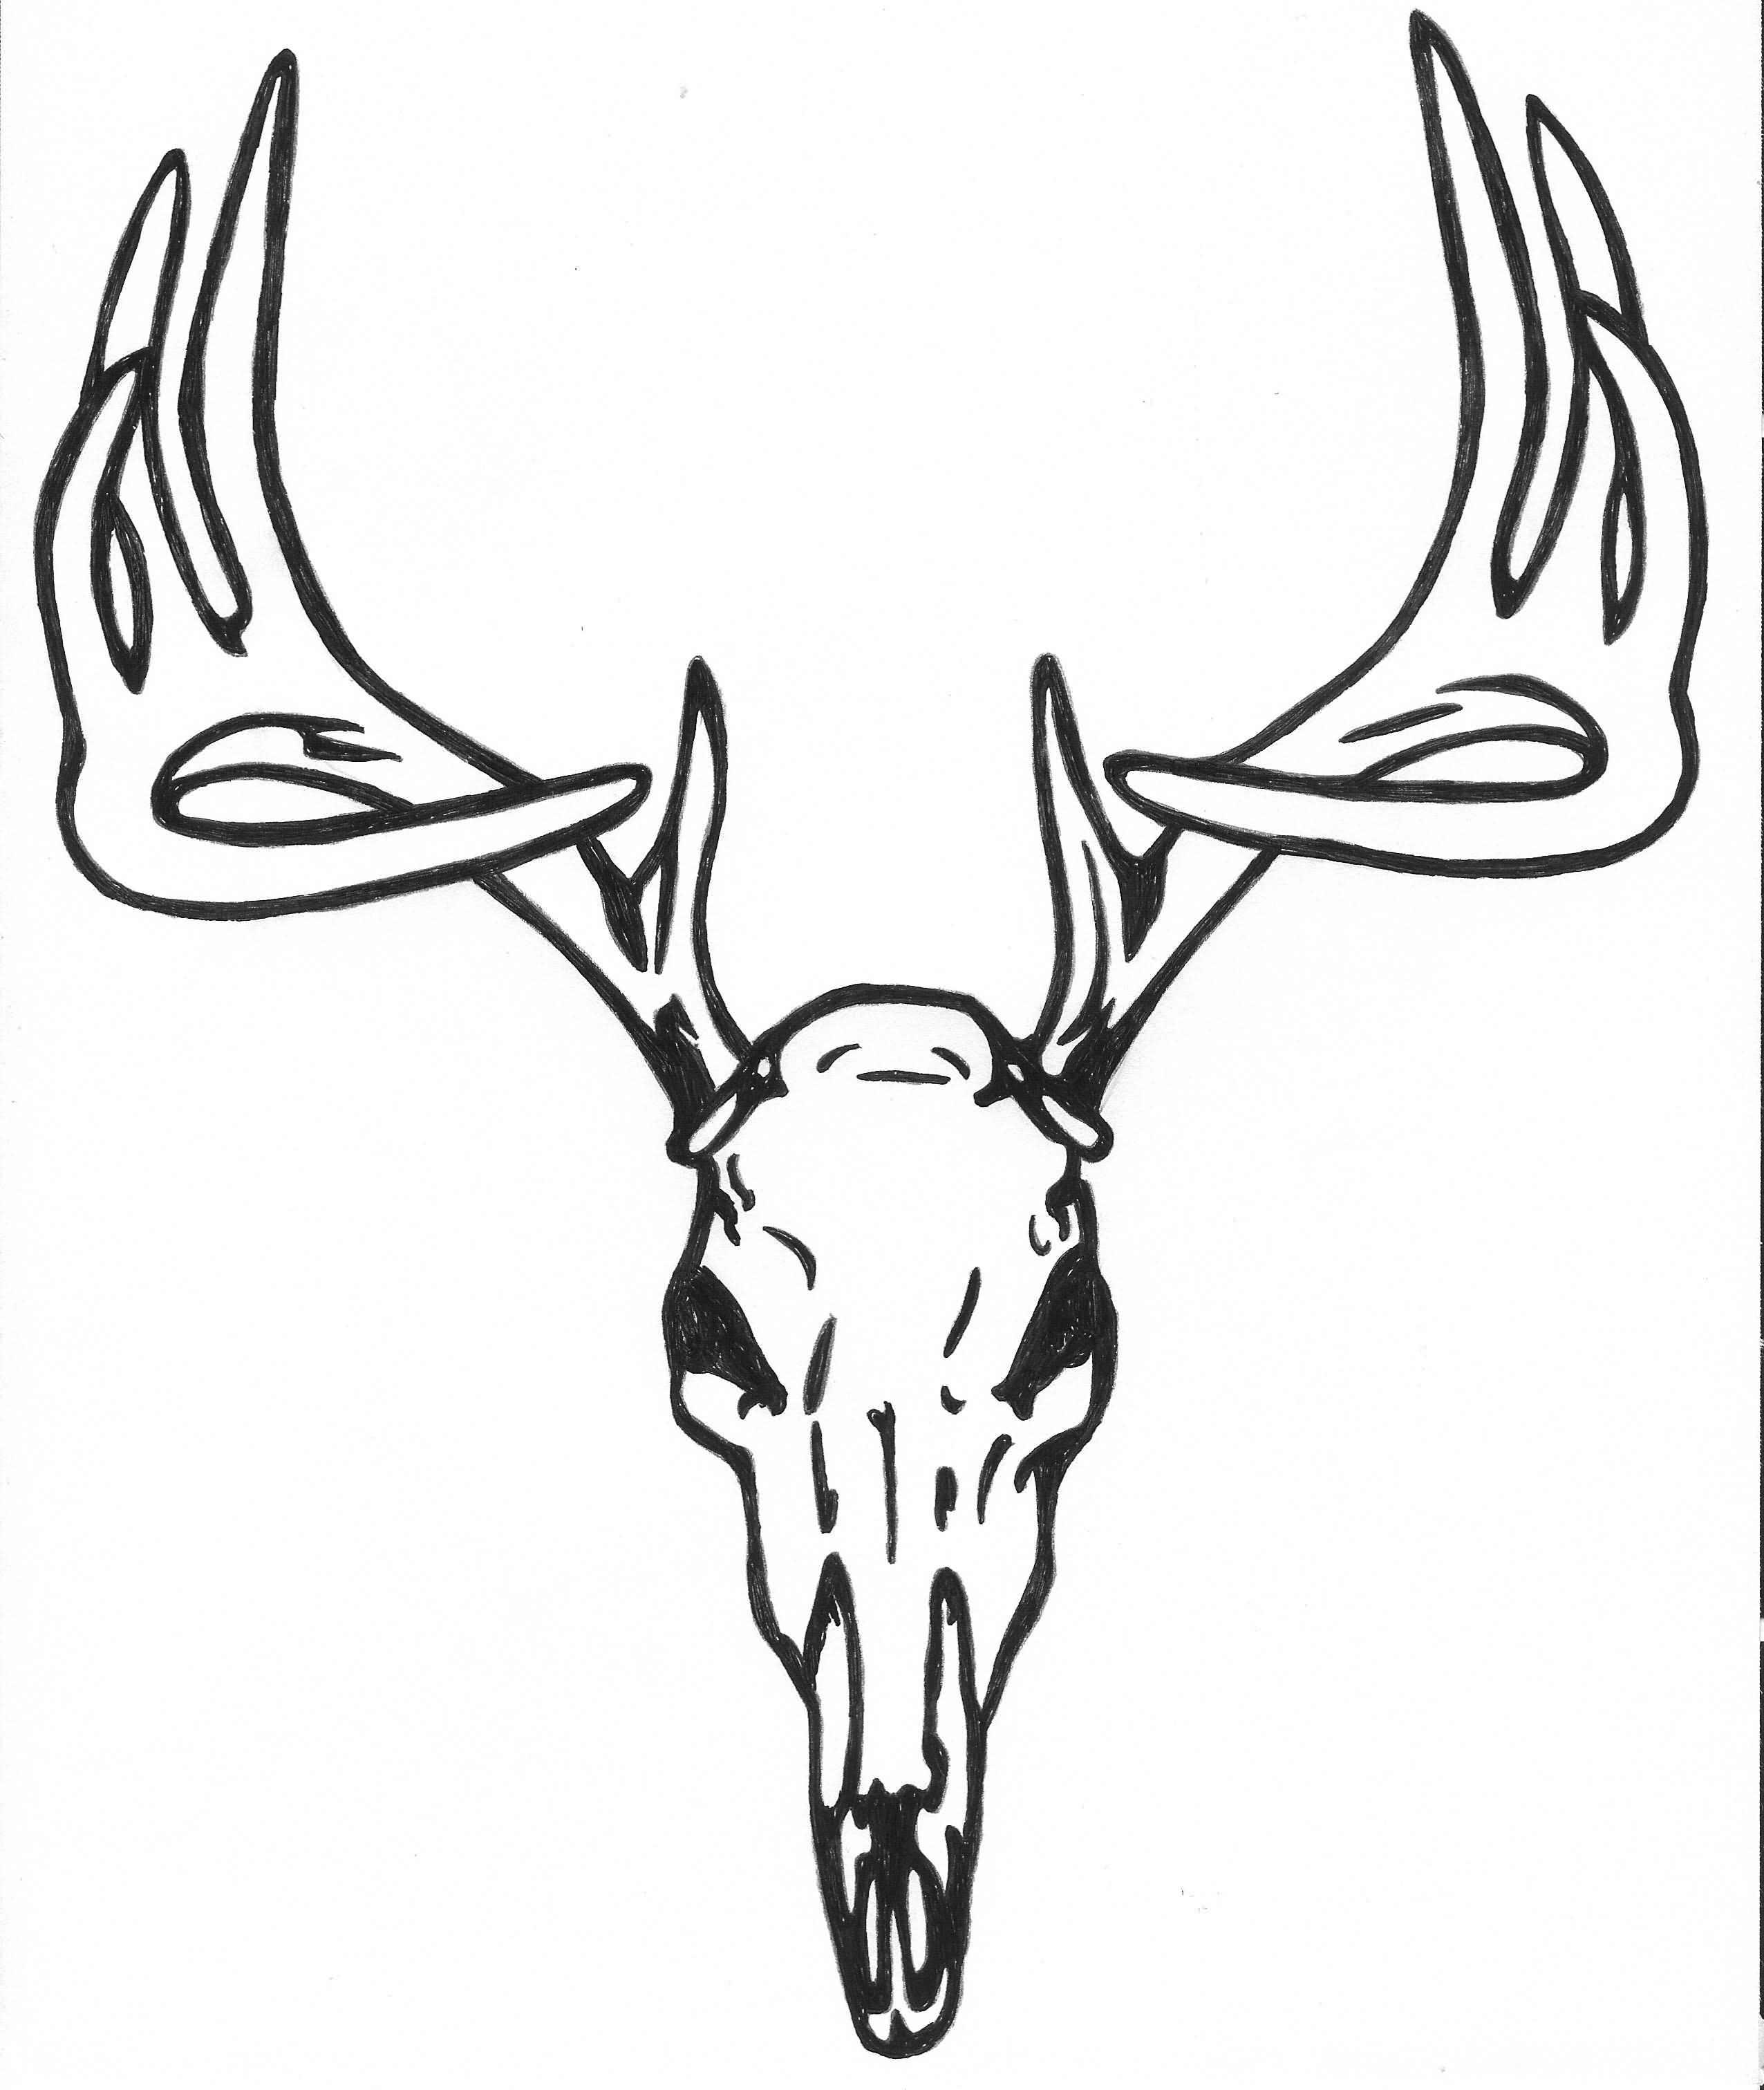 Drawn buck deer head Search  Image TATTOOS skull